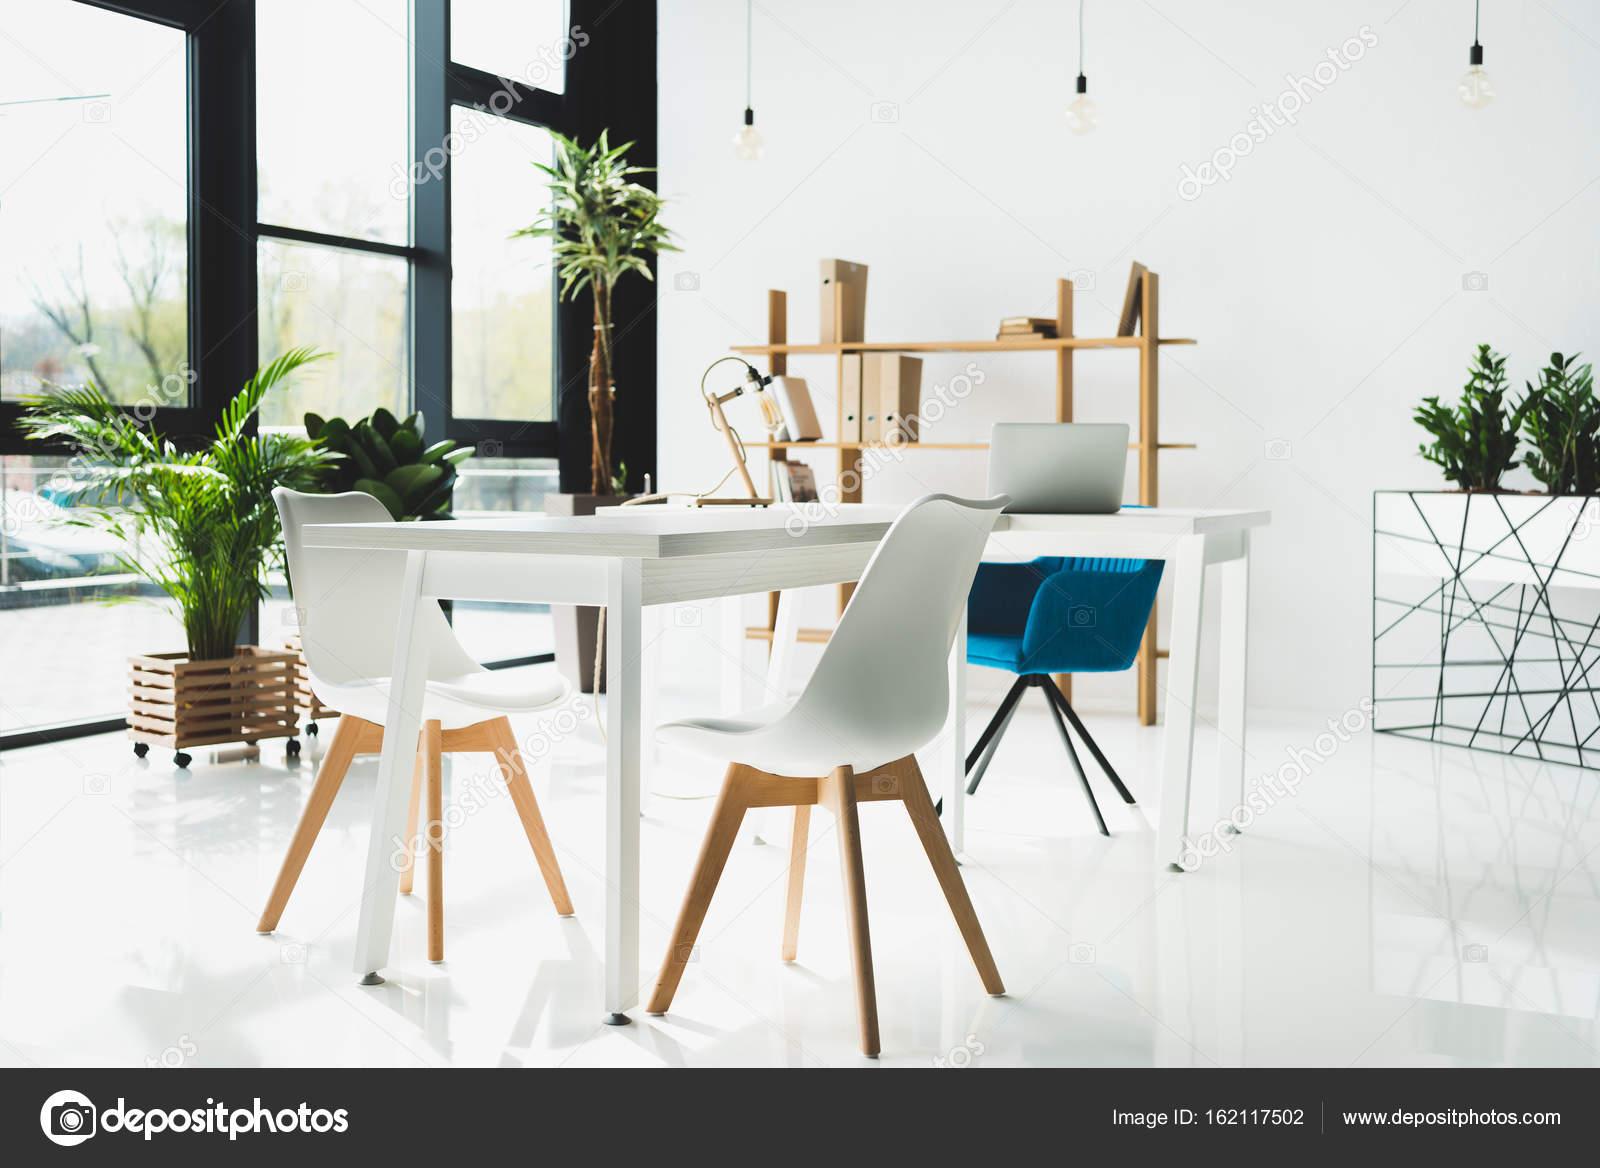 kantoor interieur — Stockfoto © AlexNazaruk #162117502